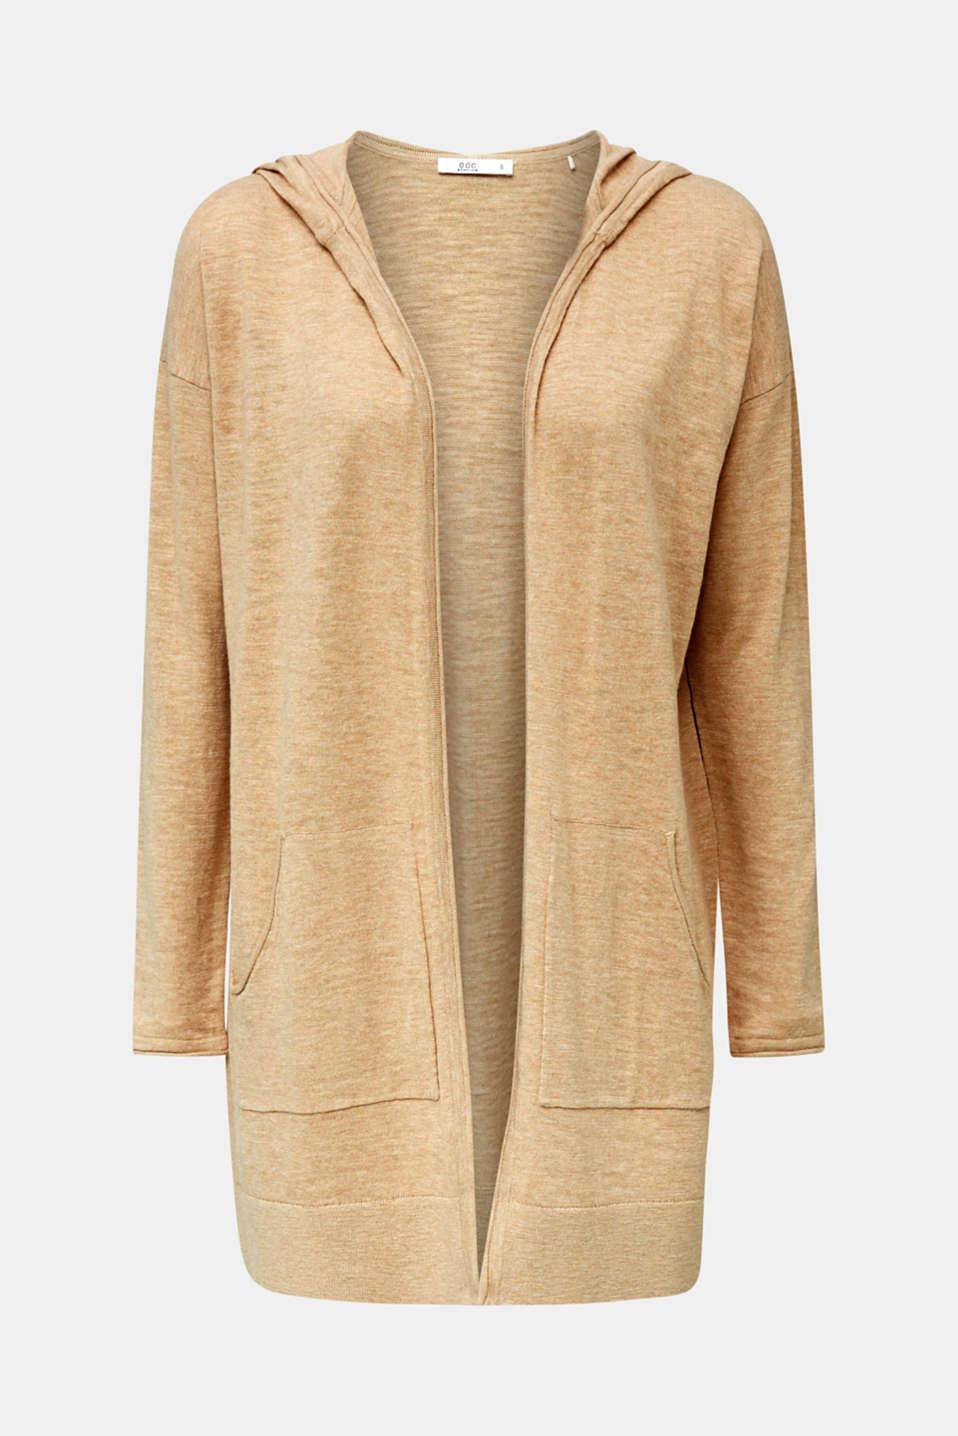 Cardigan, 100% cotton, LIGHT BEIGE 5, detail image number 6